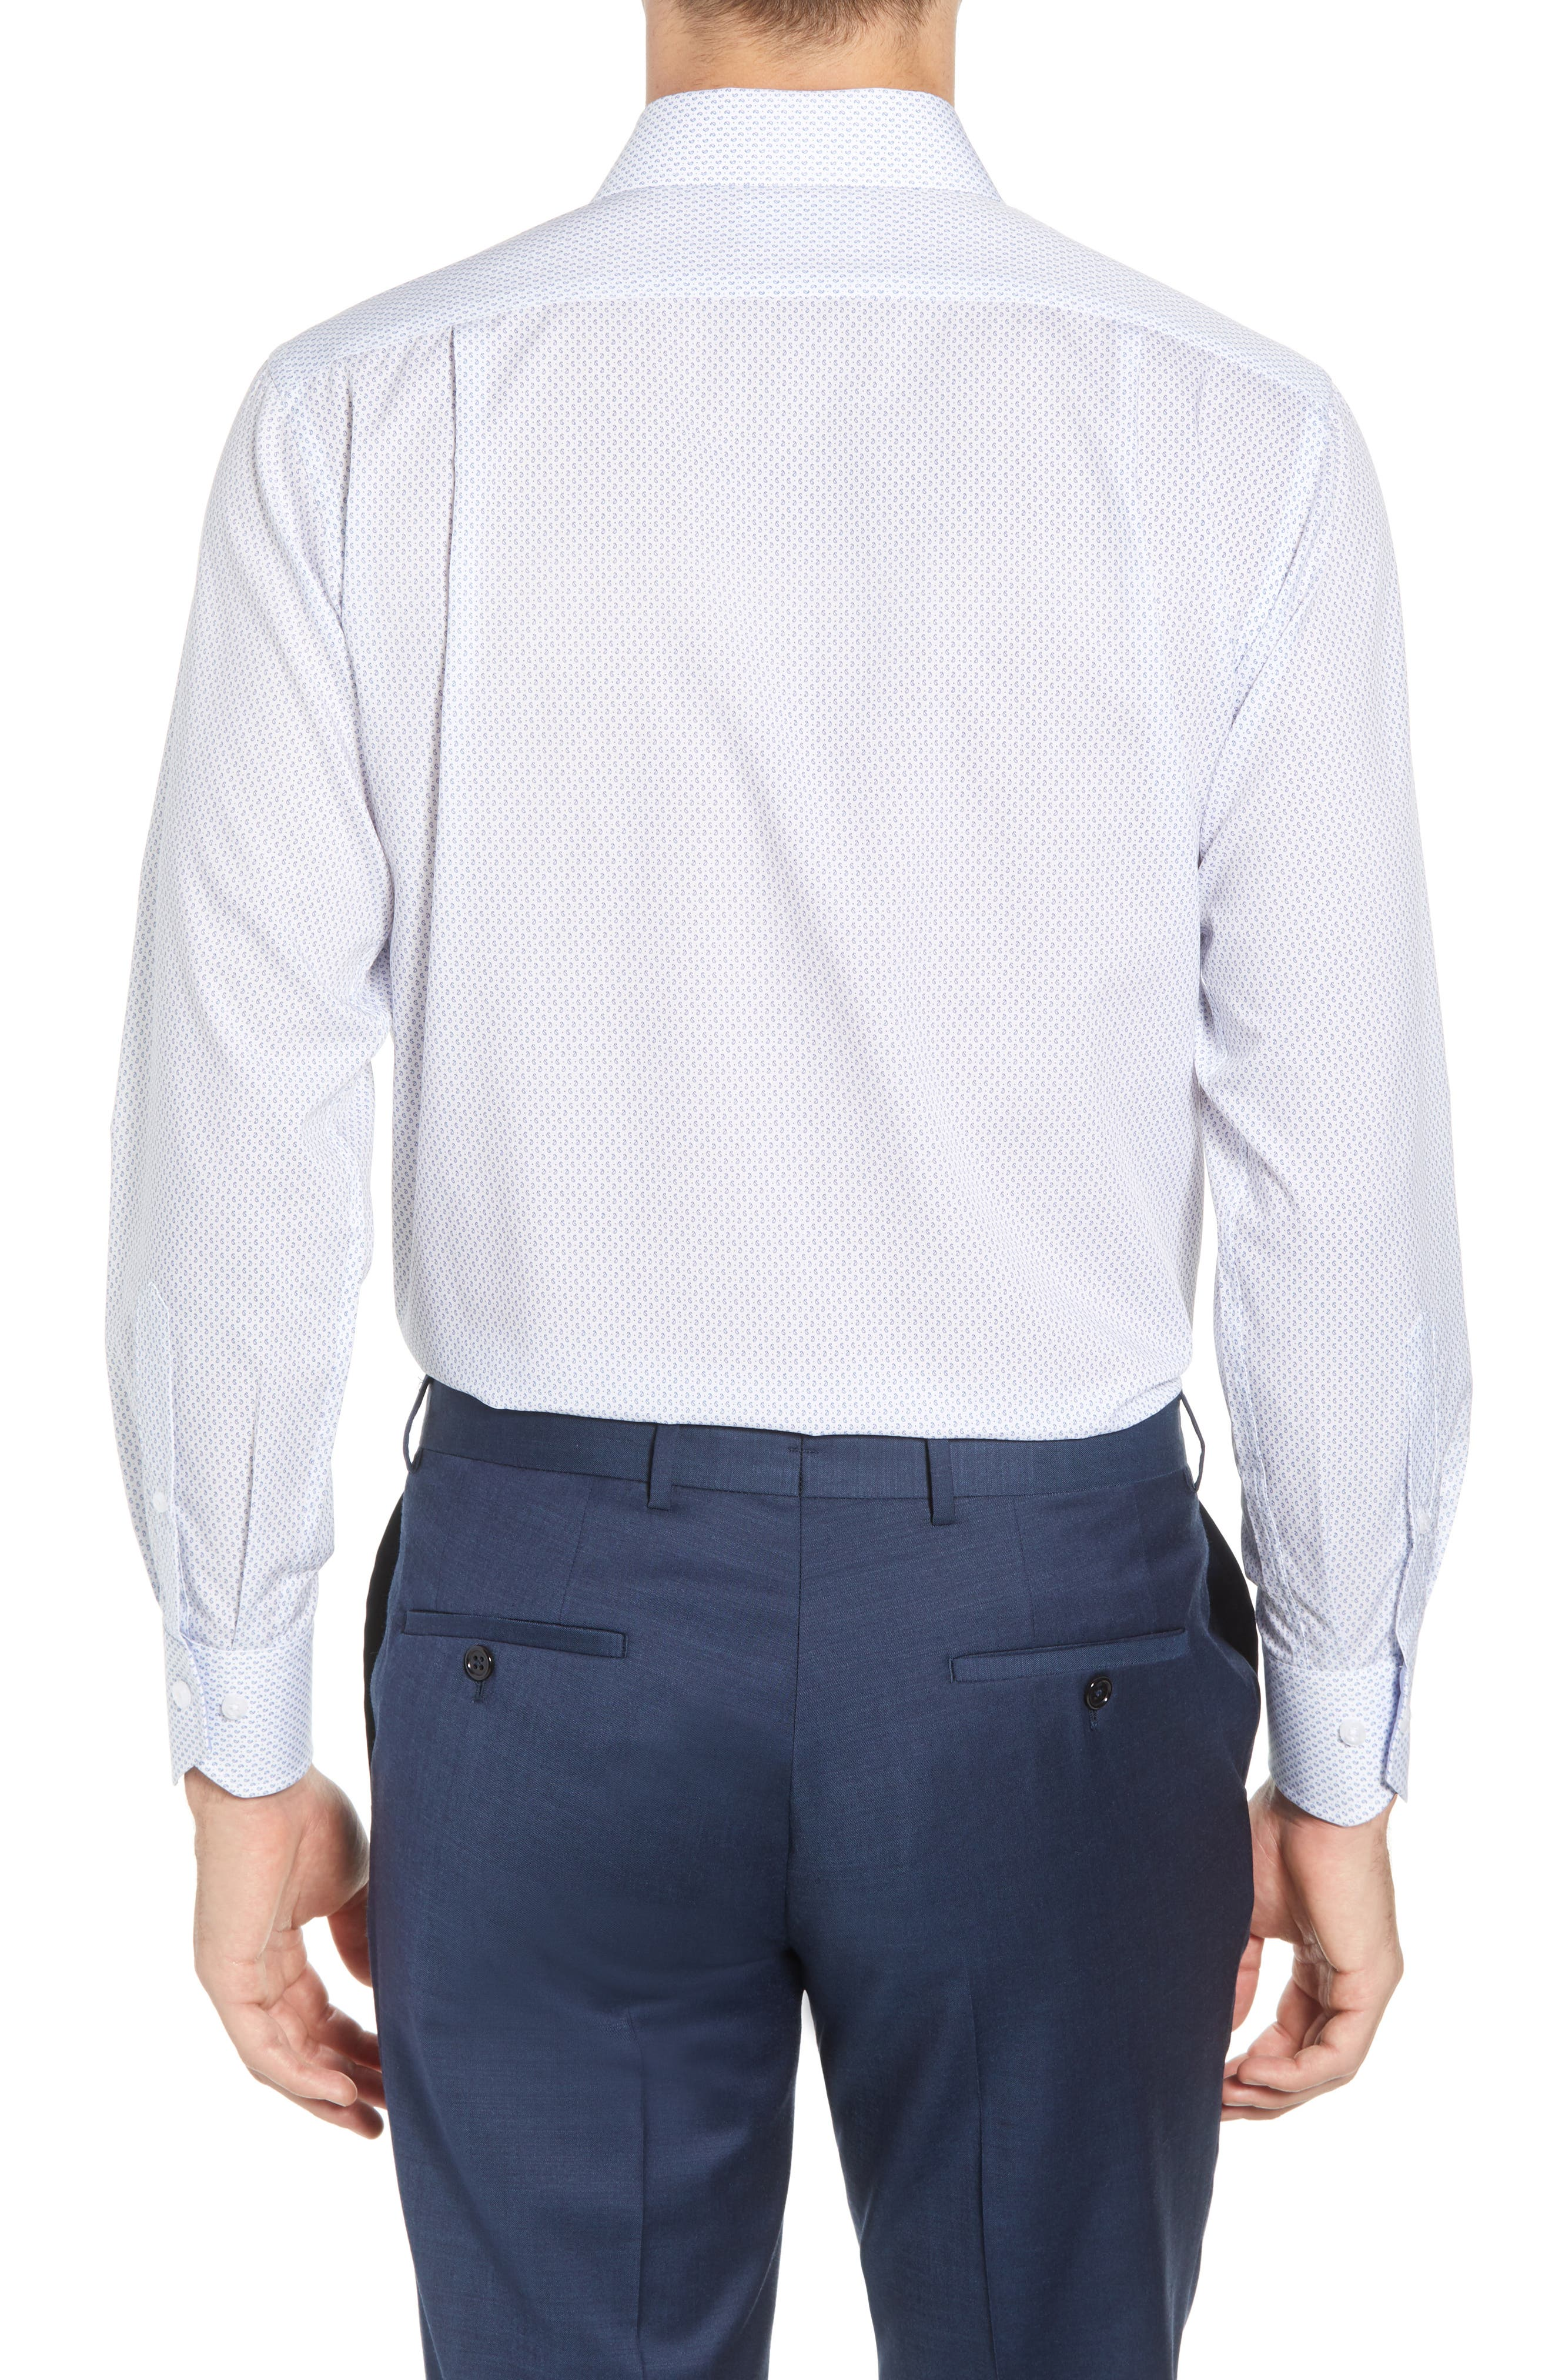 LORENZO UOMO,                             Trim Fit Paisley Dress Shirt,                             Alternate thumbnail 3, color,                             400